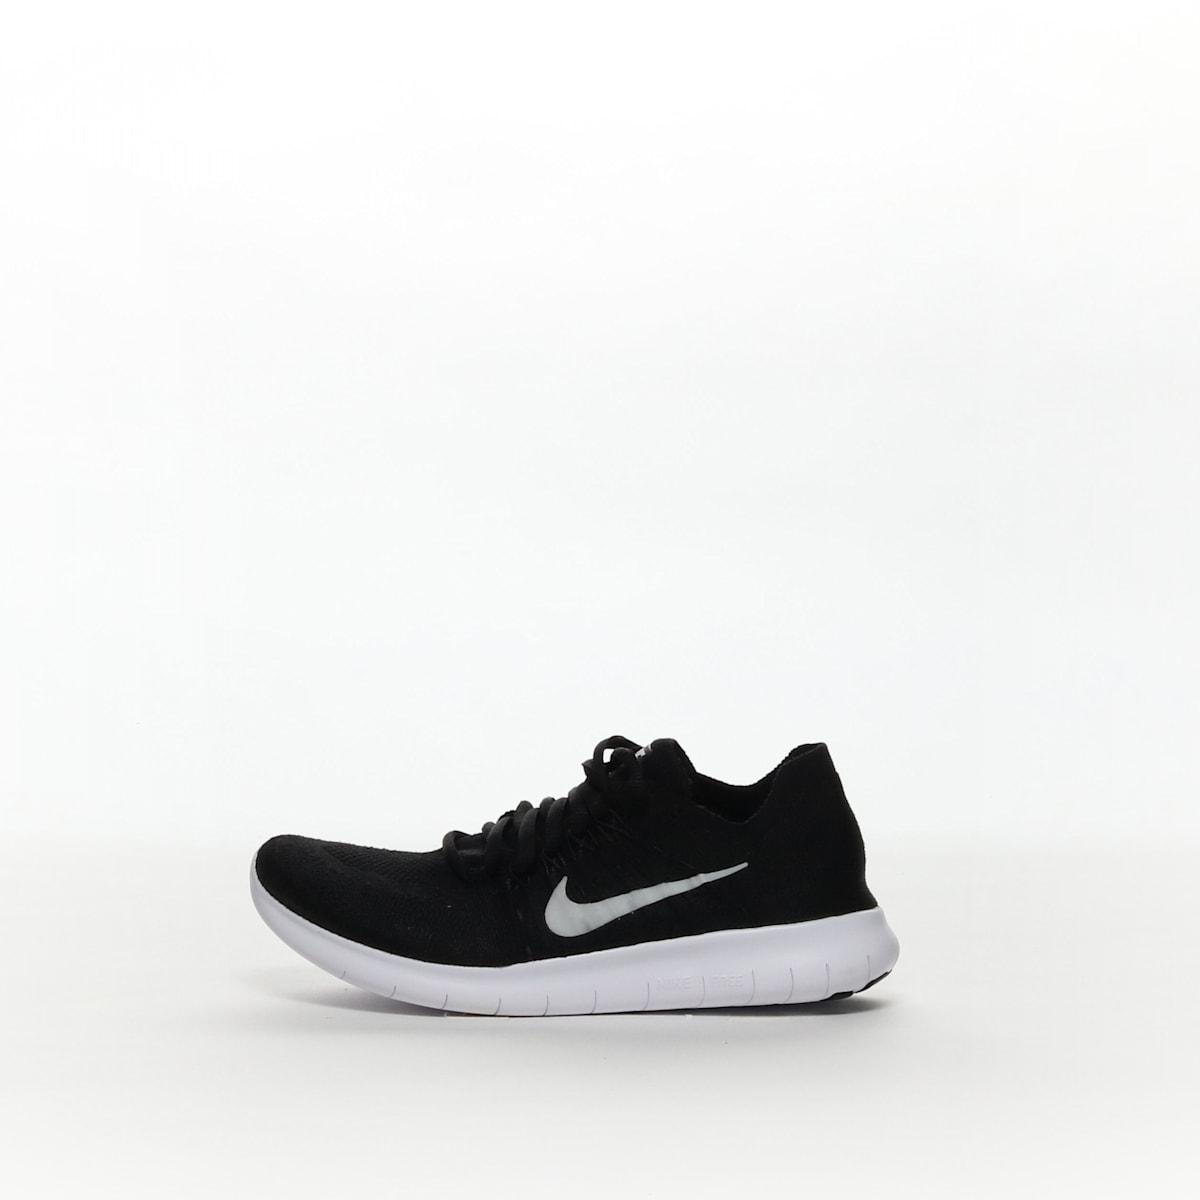 8d10b5d376d5b Nike Free RN Flyknit 2017 - BLACK/VOLT/WHITE – Resku